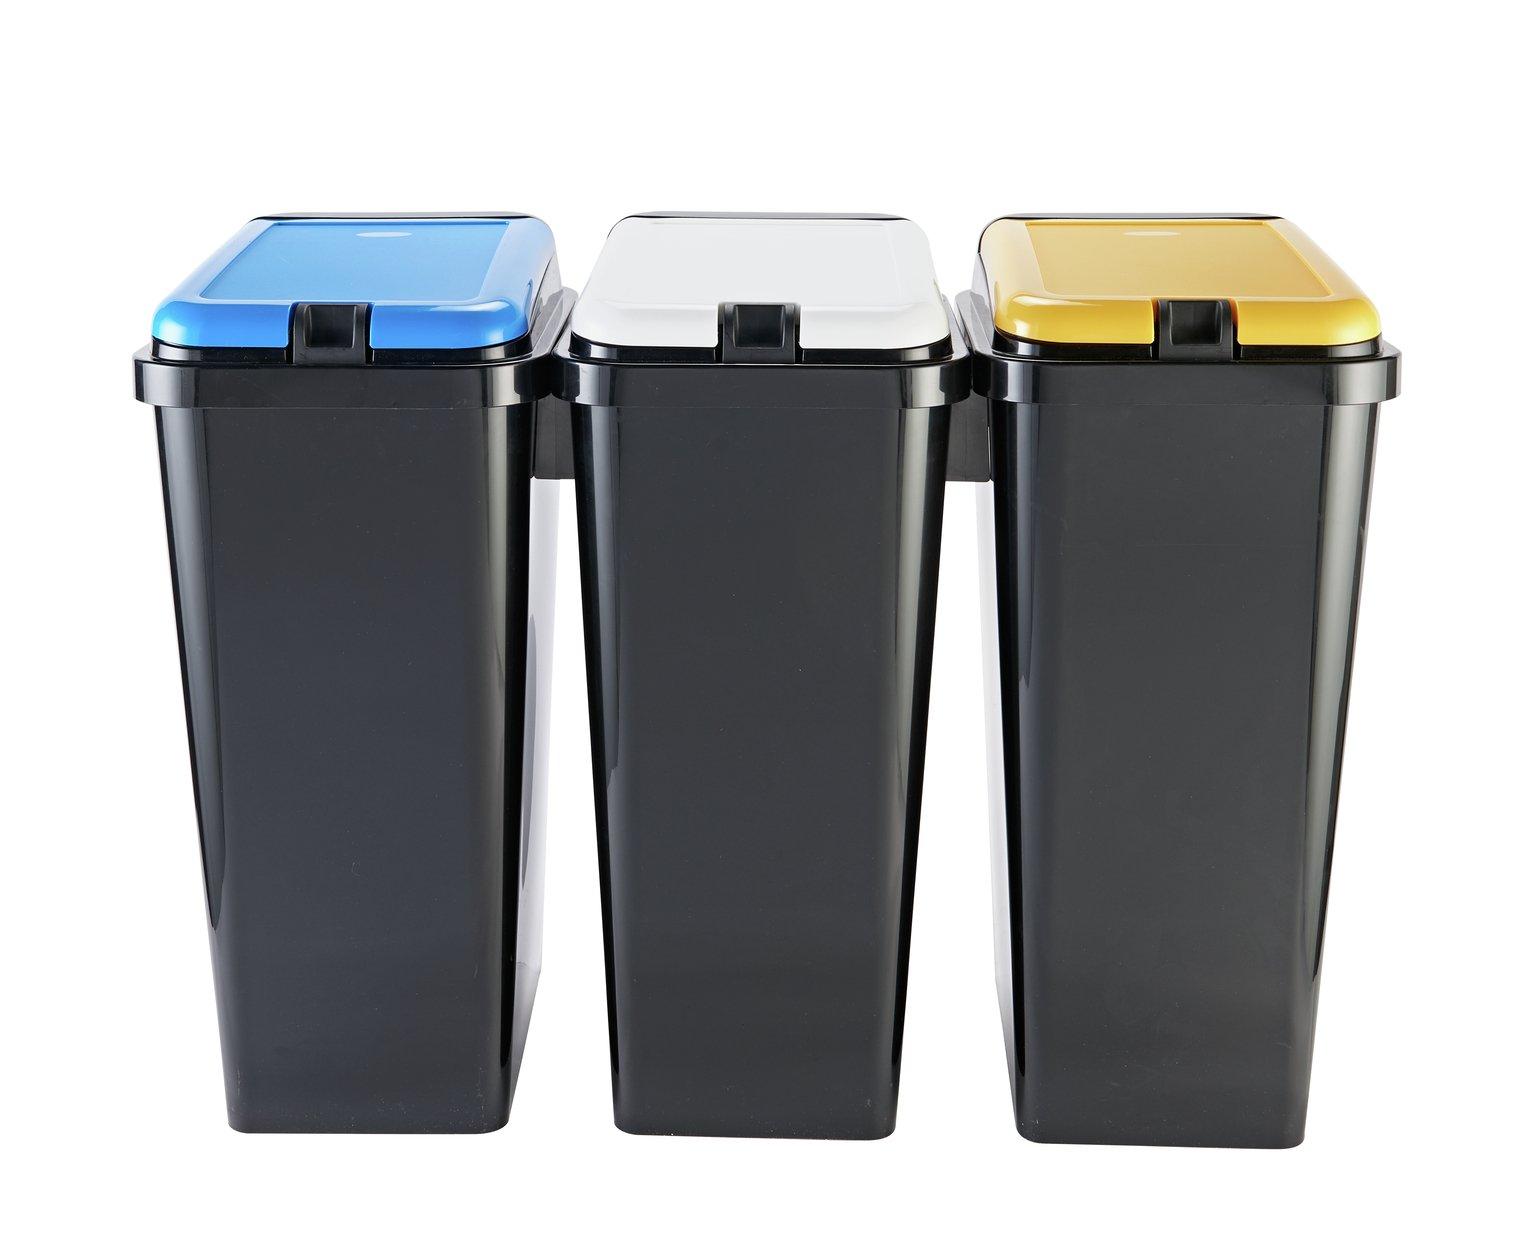 Genial Recycling Bins Kitchen Bins | Argos